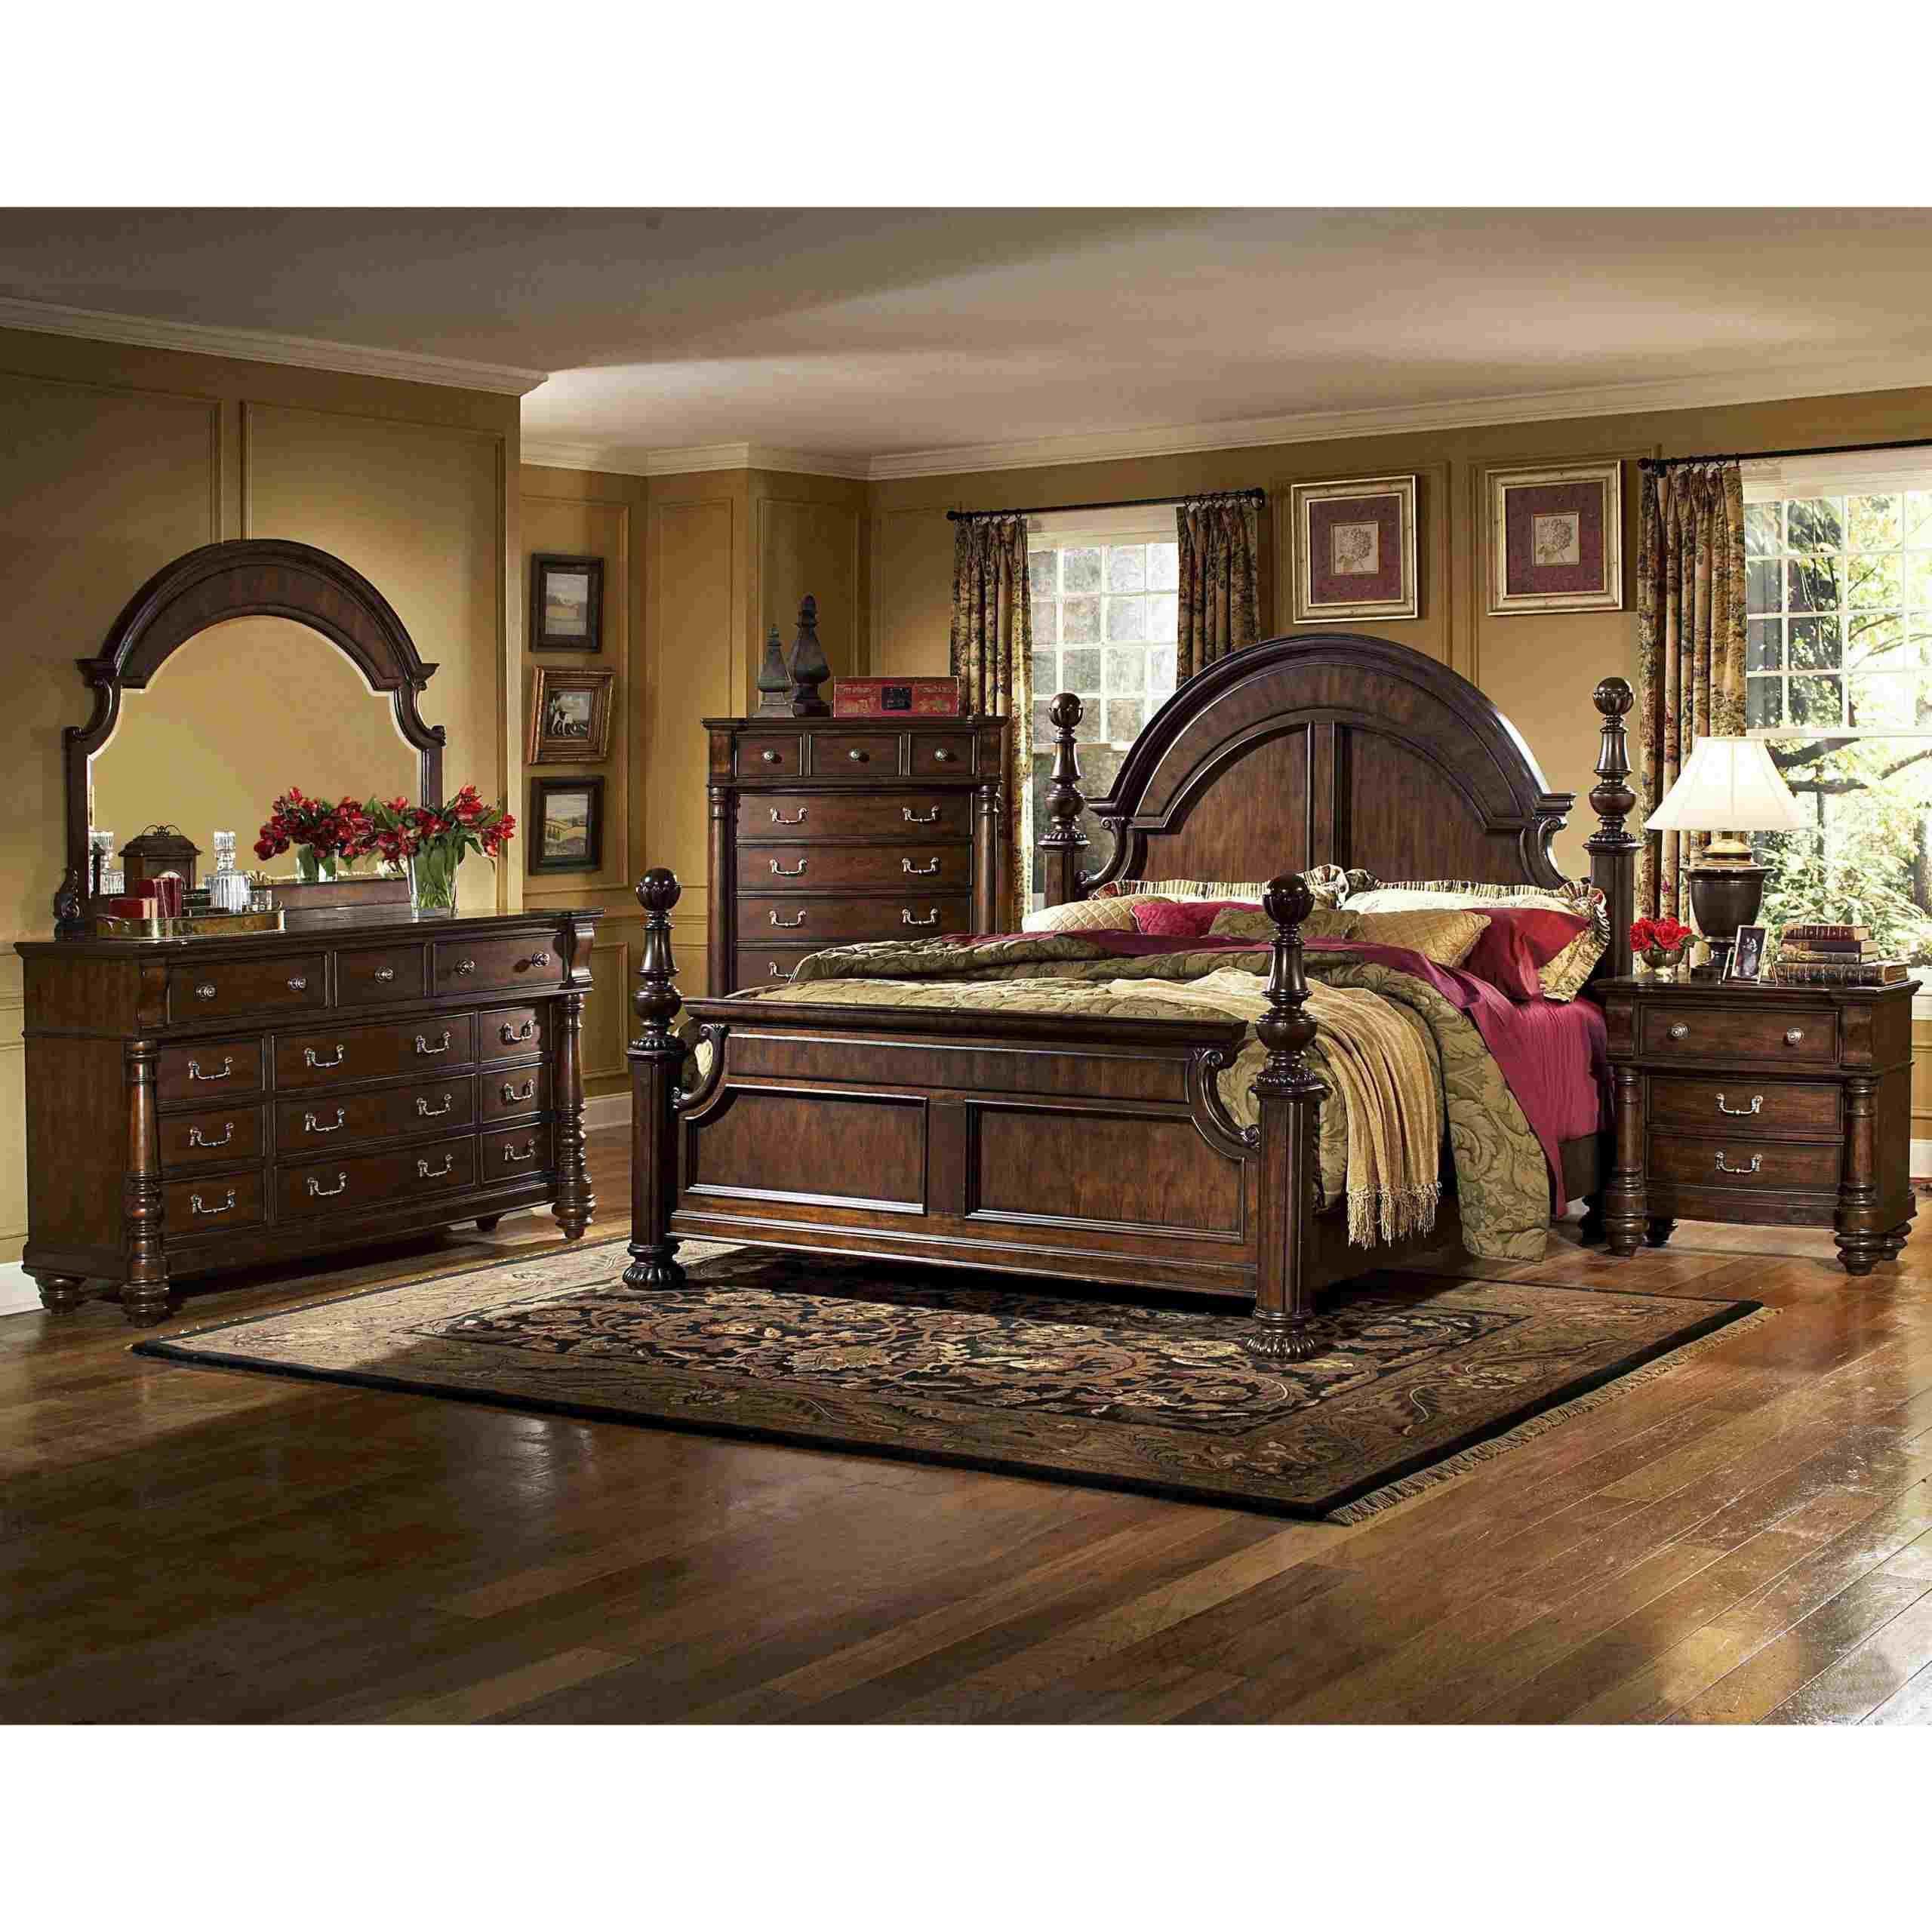 Where To Buy Bedroom Furniture Near Me Tempat Tidur Tidur Tempat